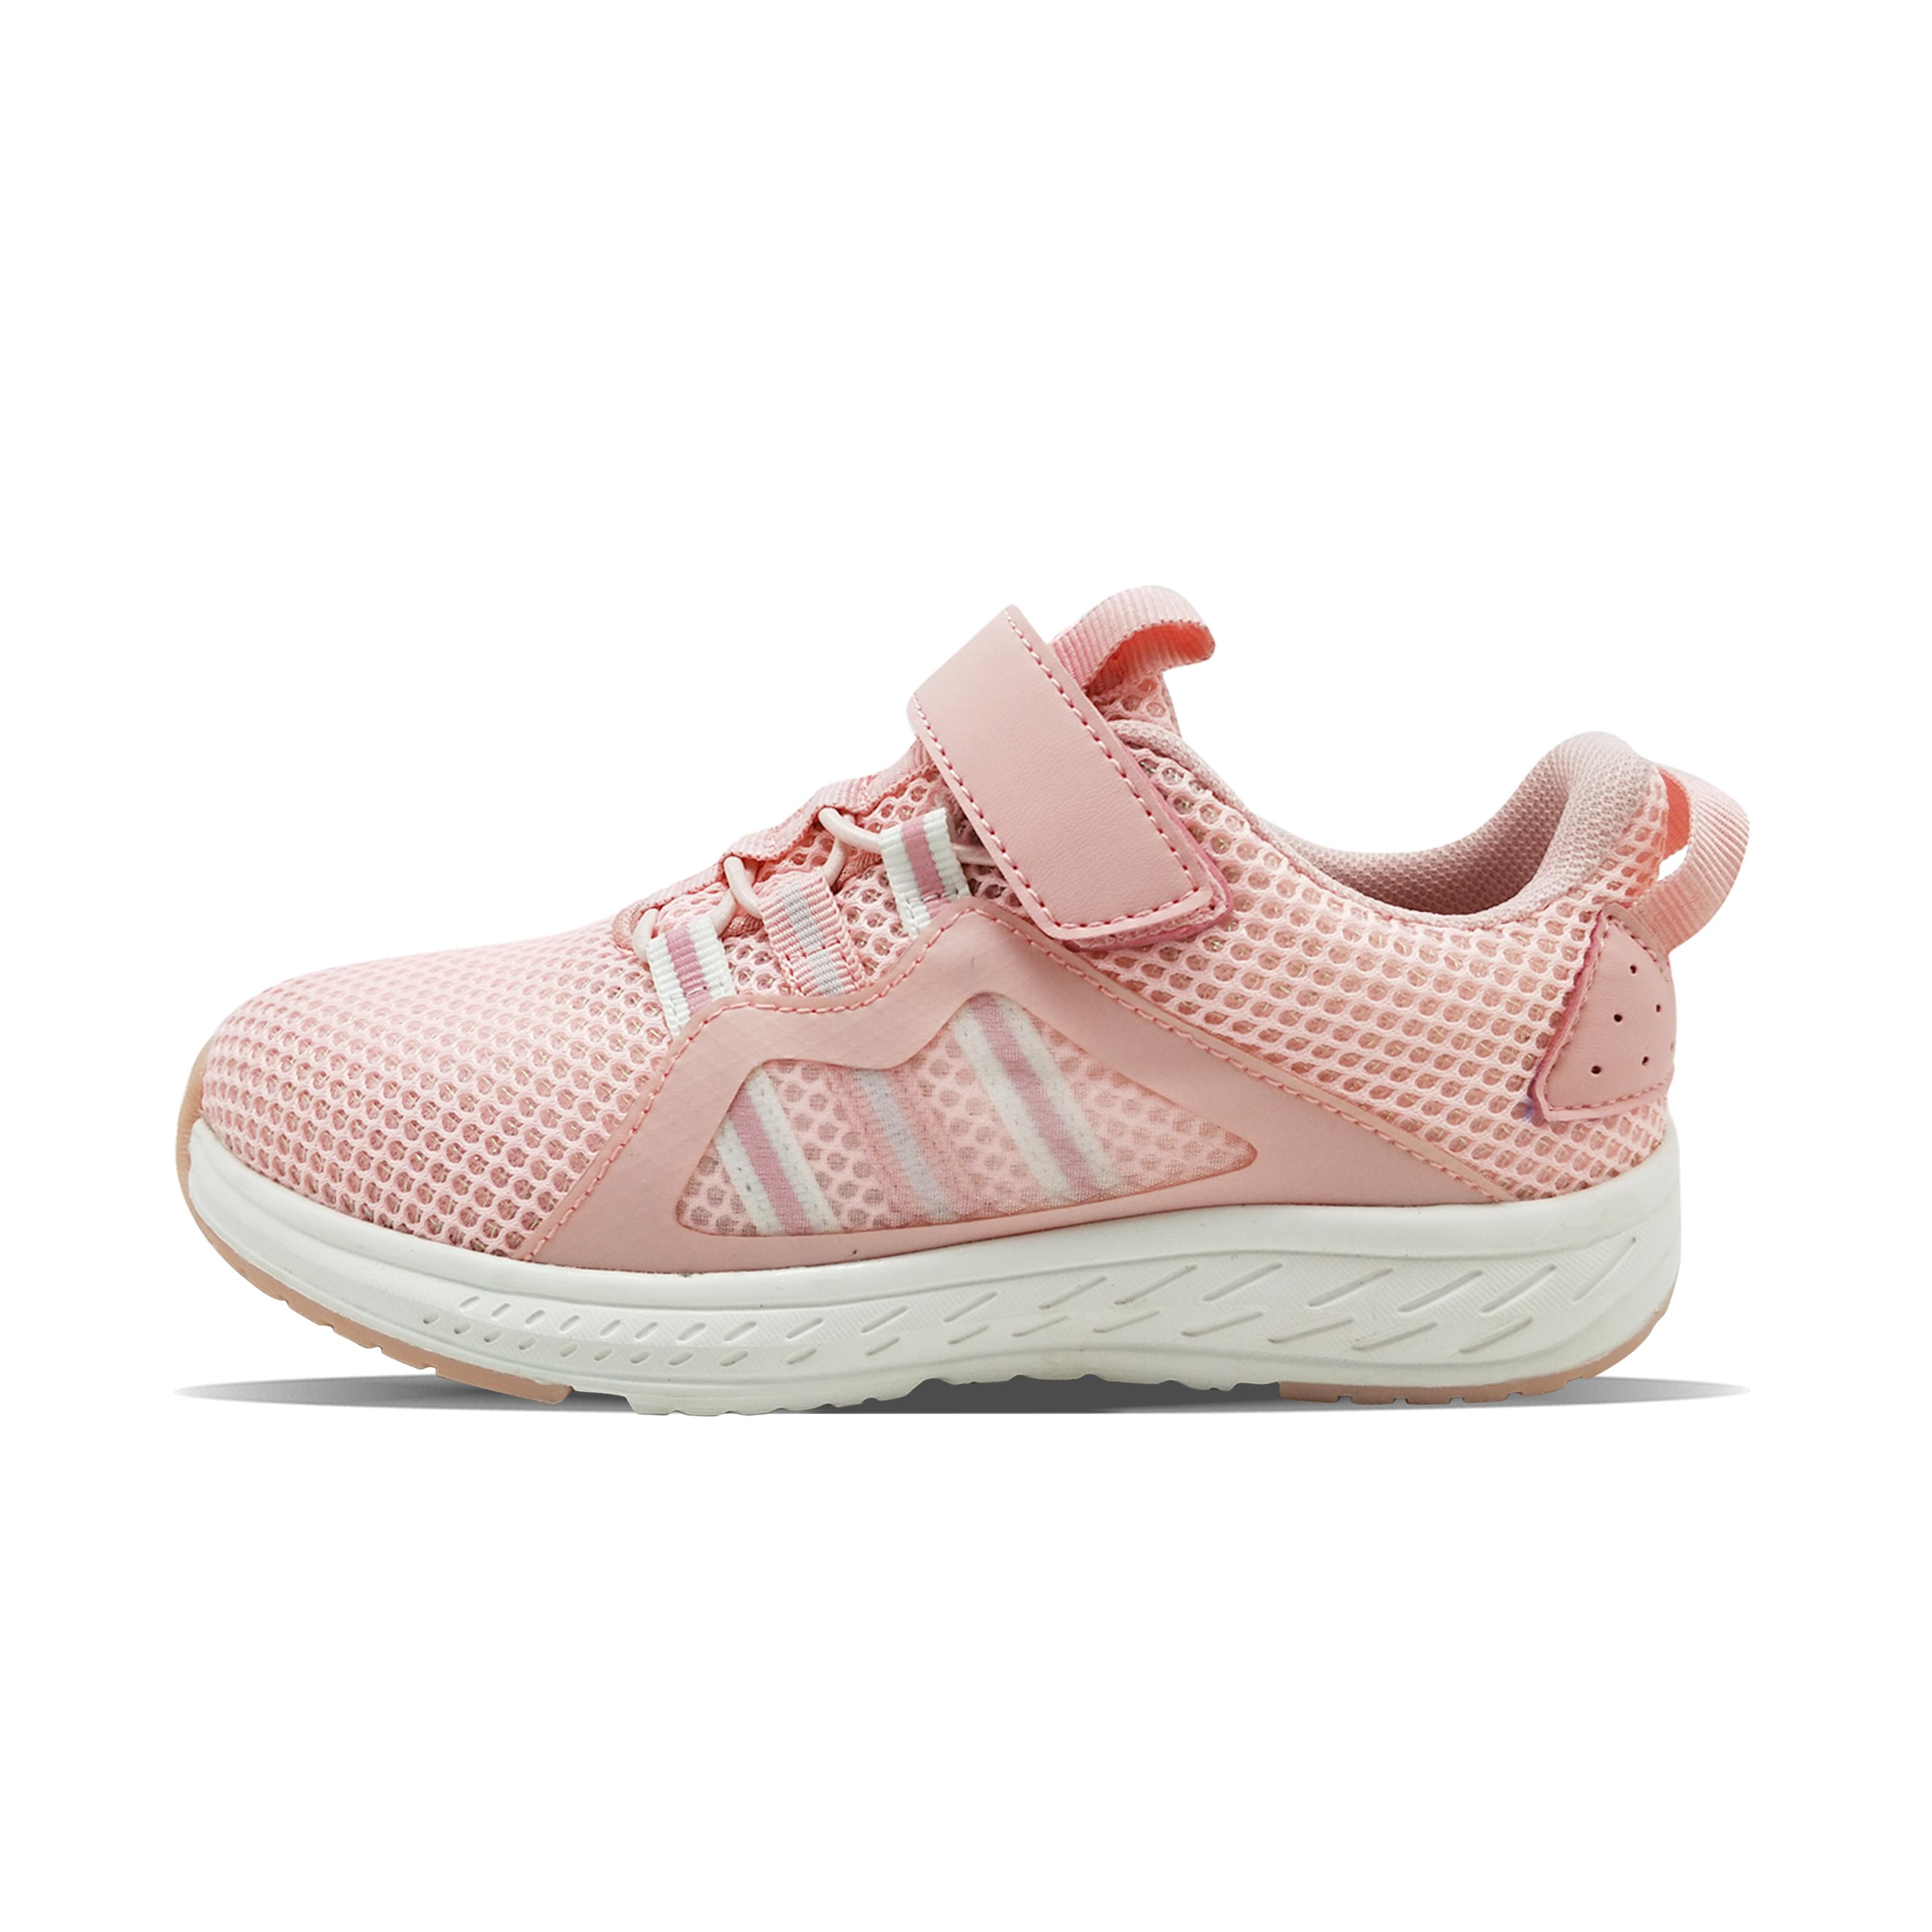 Ragazza s Pink Blue magic tape heel print press PU mesh TPU scarpe sportive